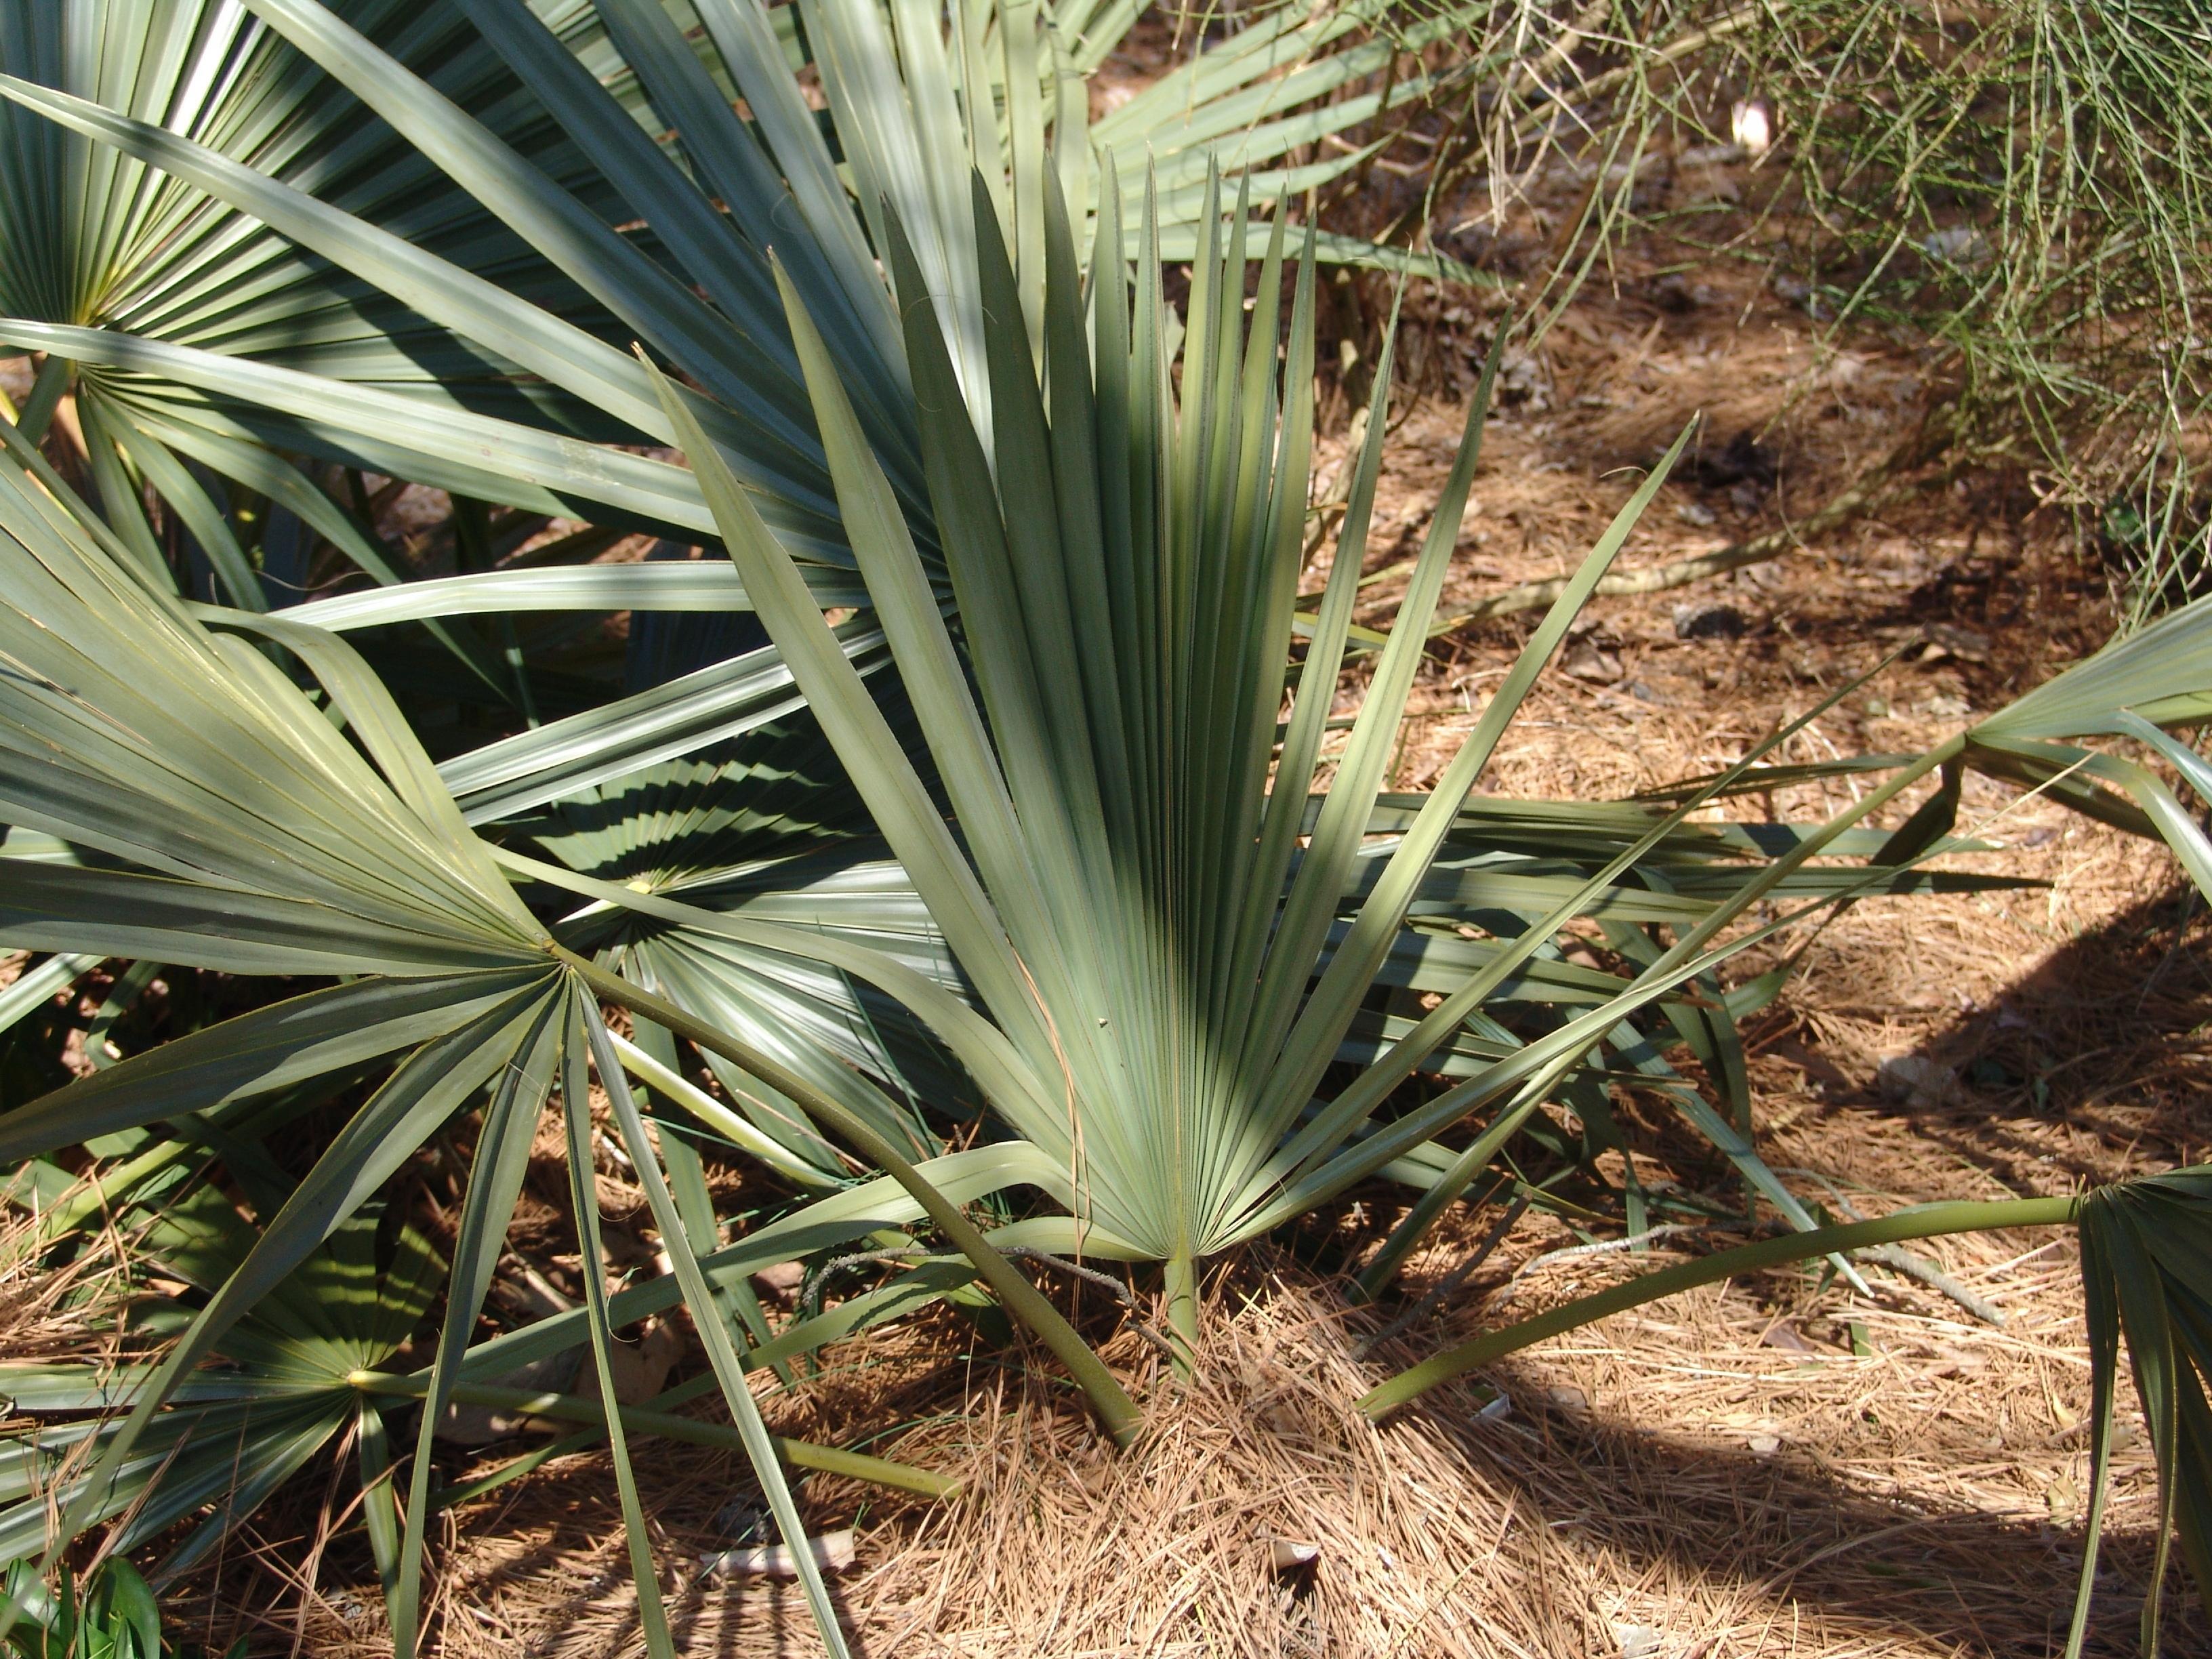 Image of dwarf palmetto